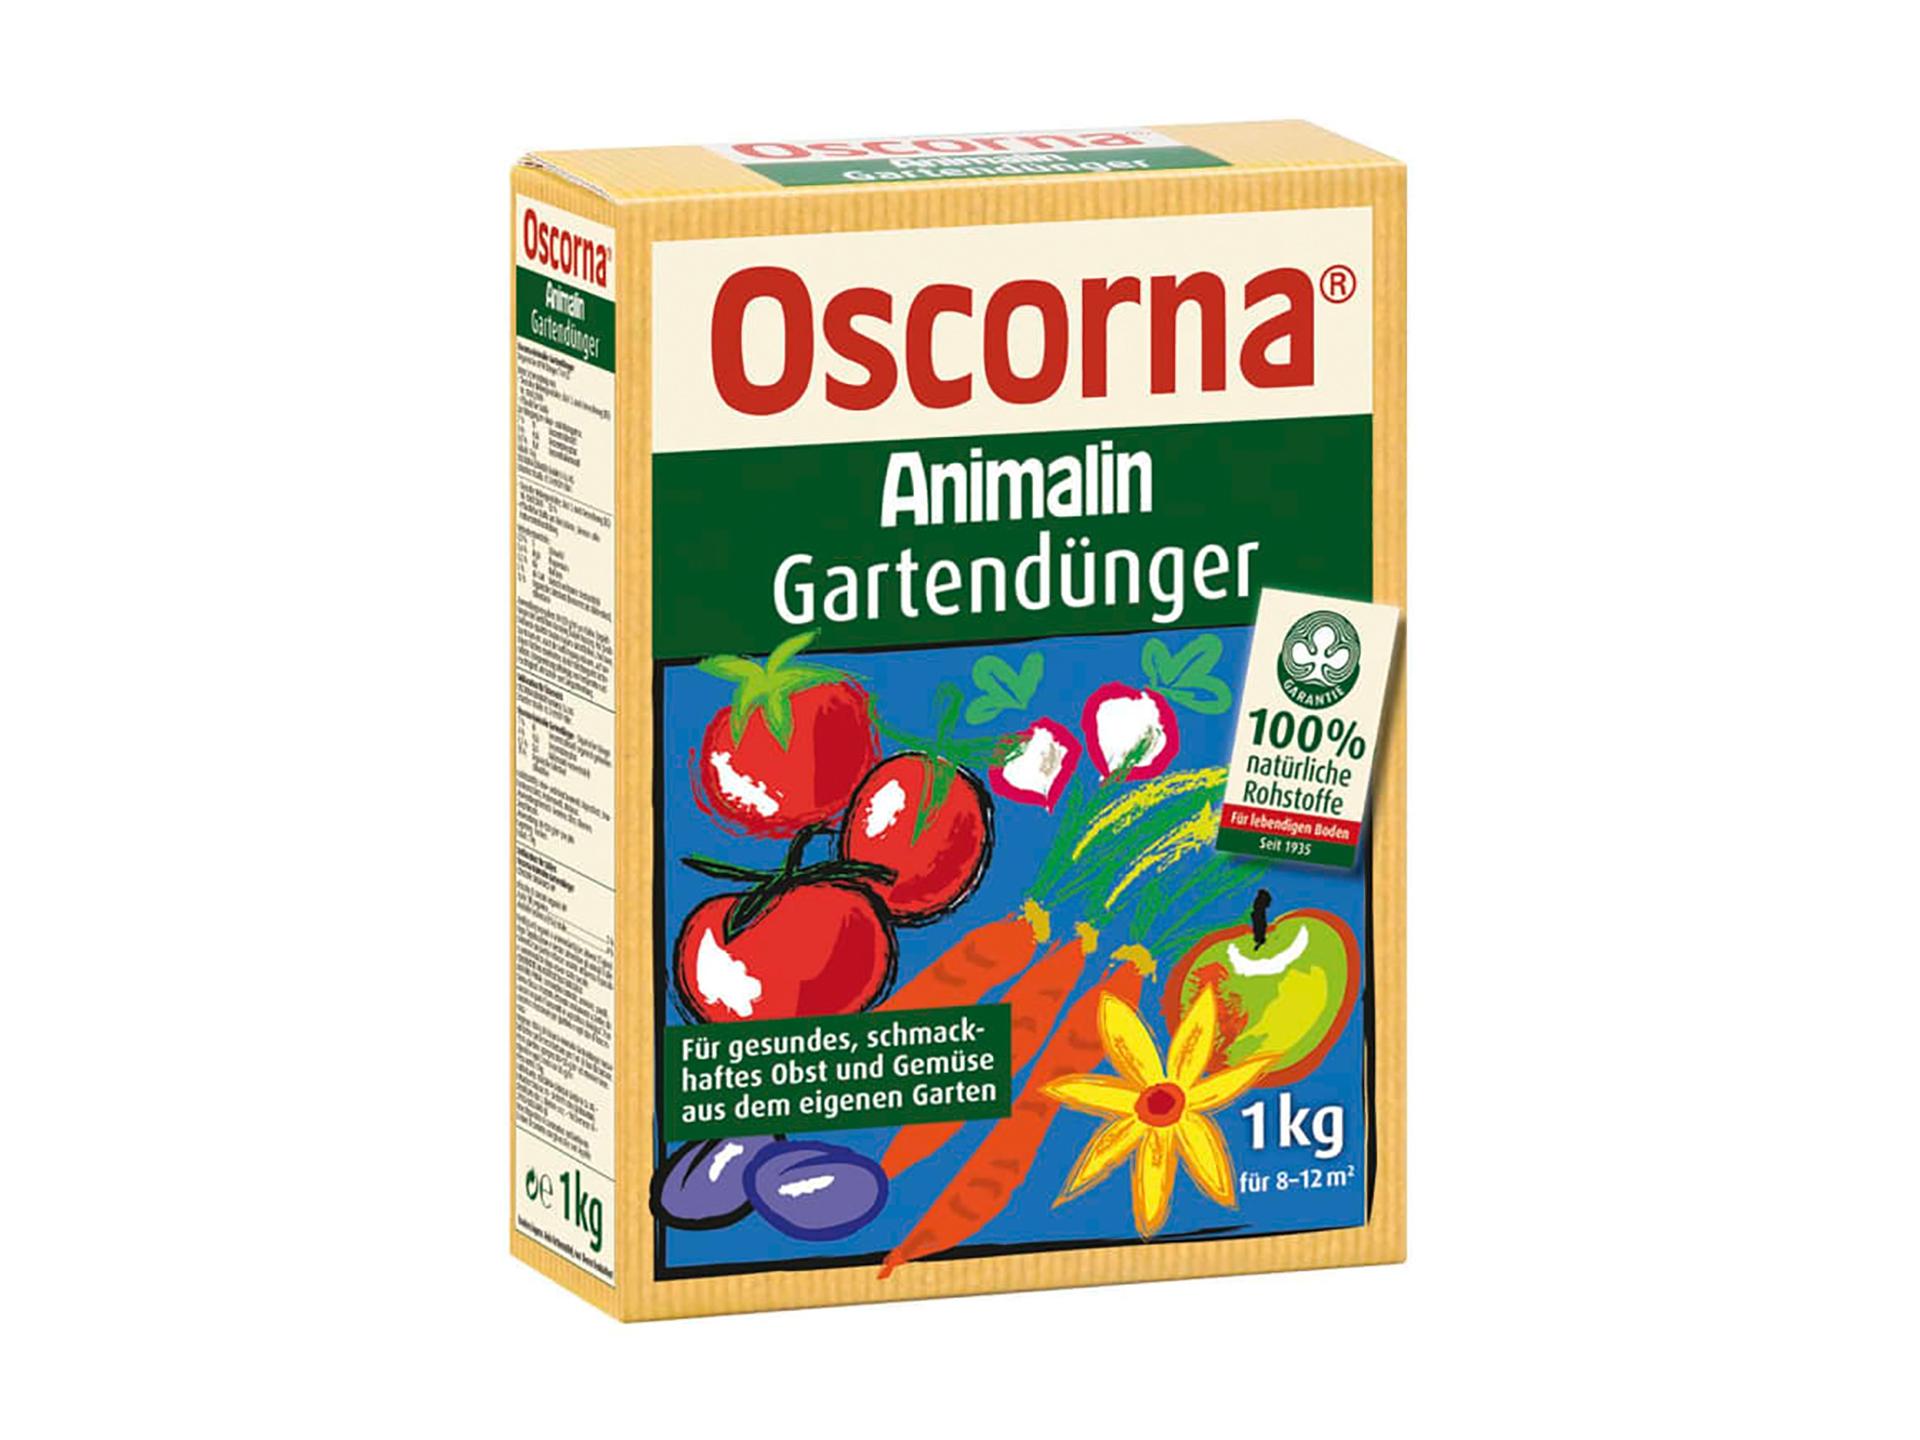 Oscorna Animalin Gartendünger 1kg